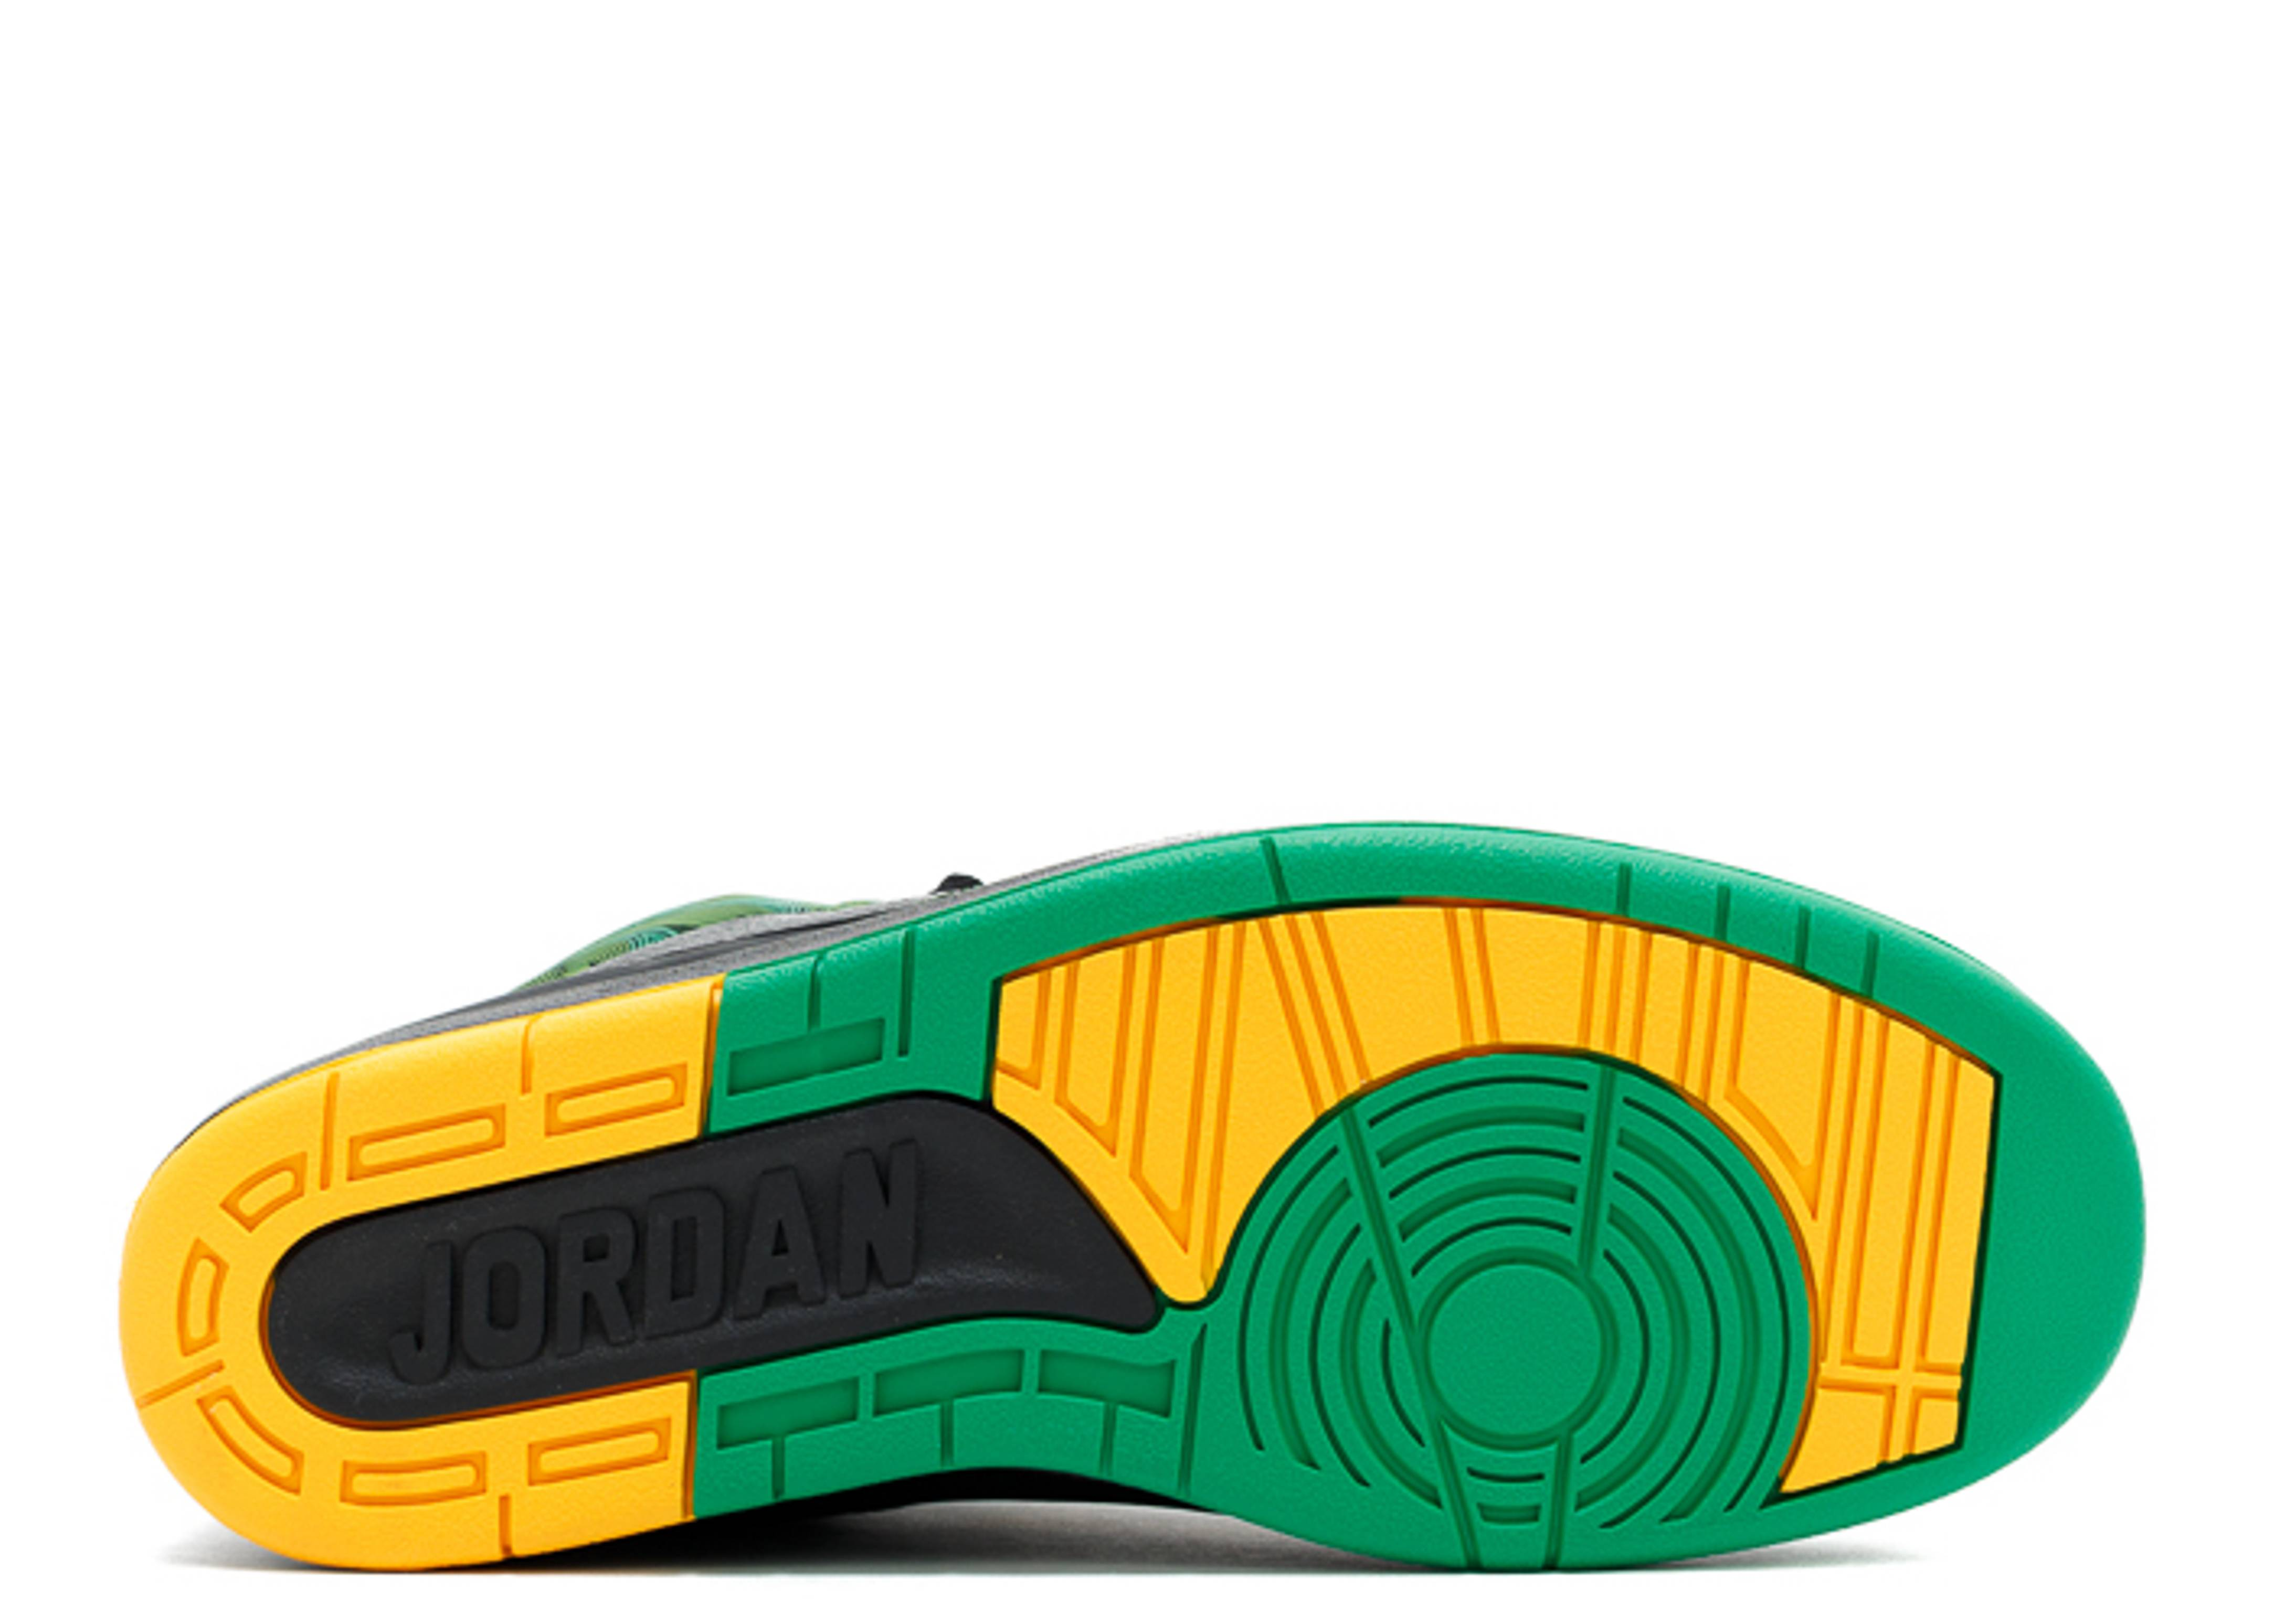 833148fc77eda6 Air Jordan 2 High Db